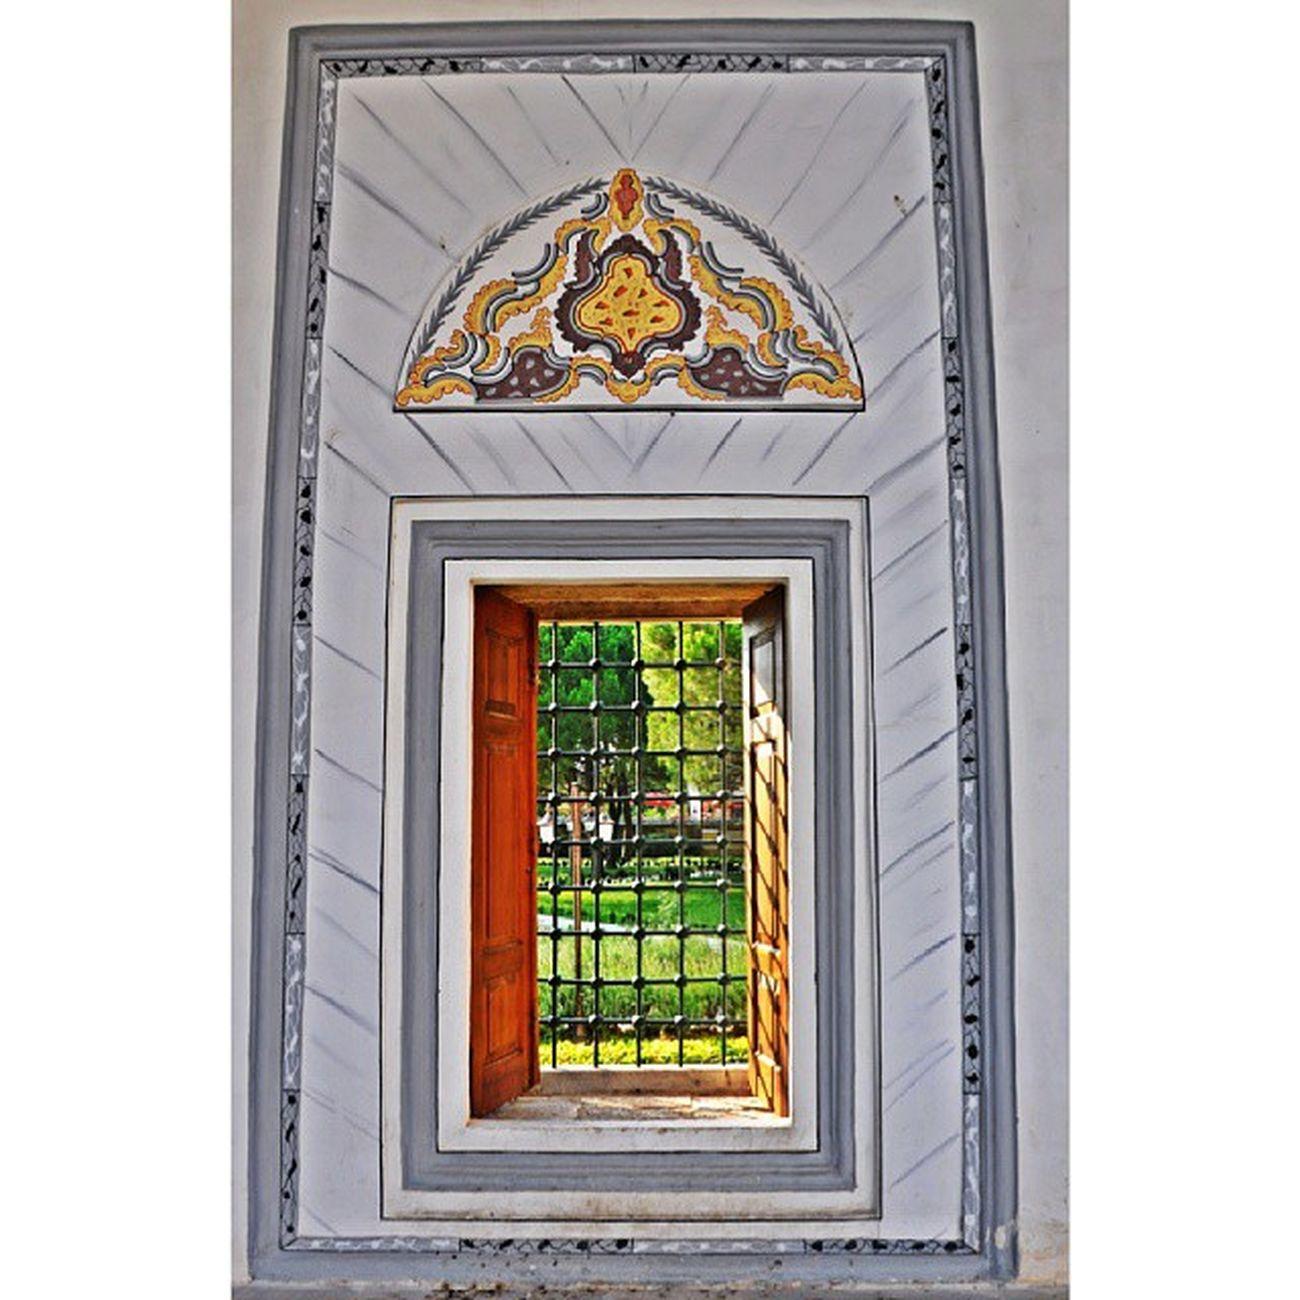 Pencere Window Selimiye Edirne city green camii mosque